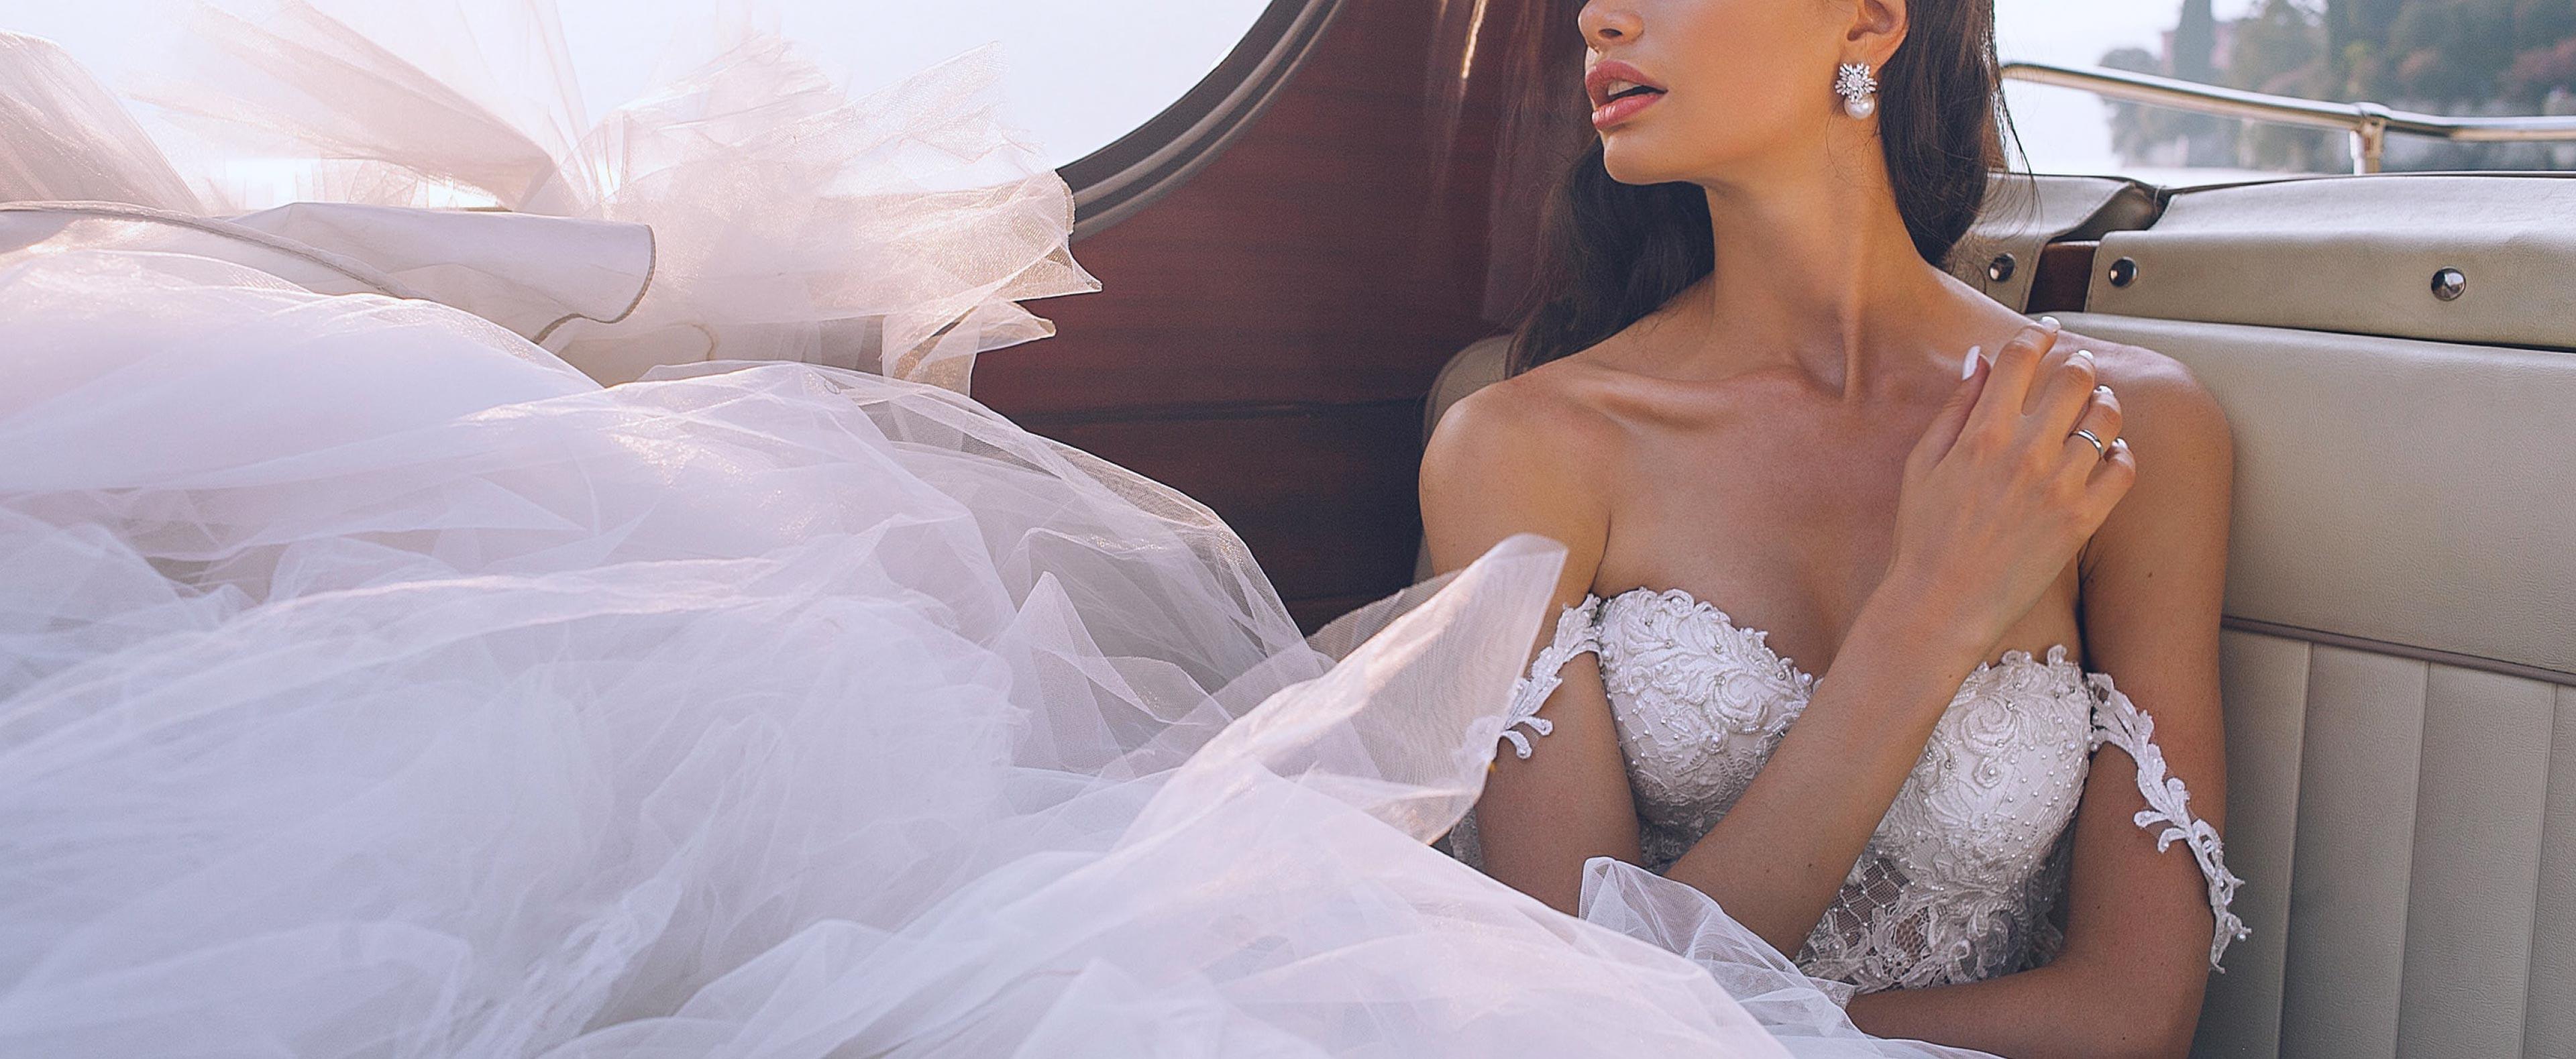 The Wedding Club - Servizzi - Nozze